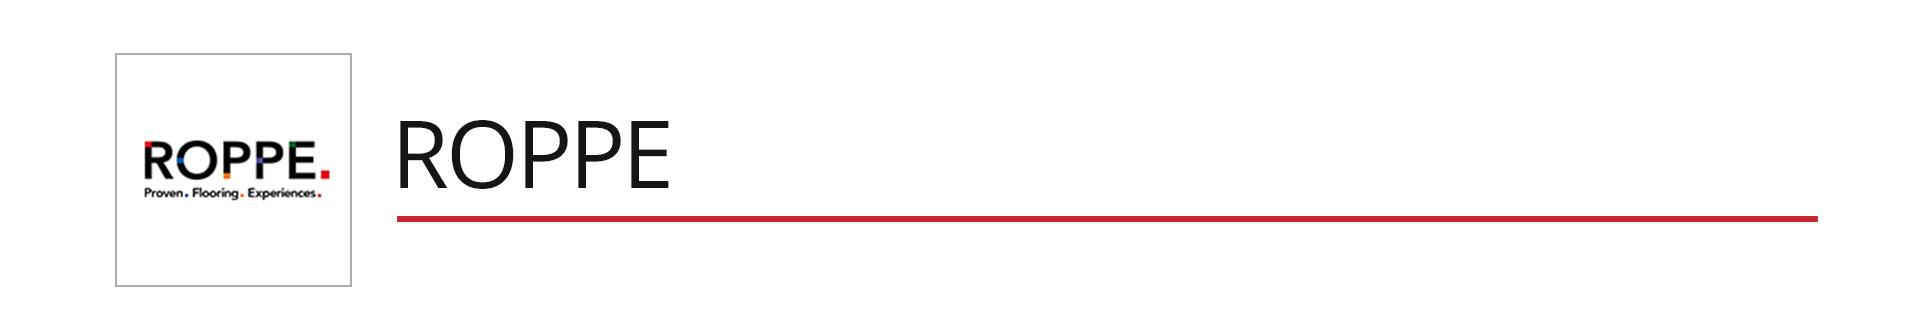 ROPPE_CADBlock-Header.jpg